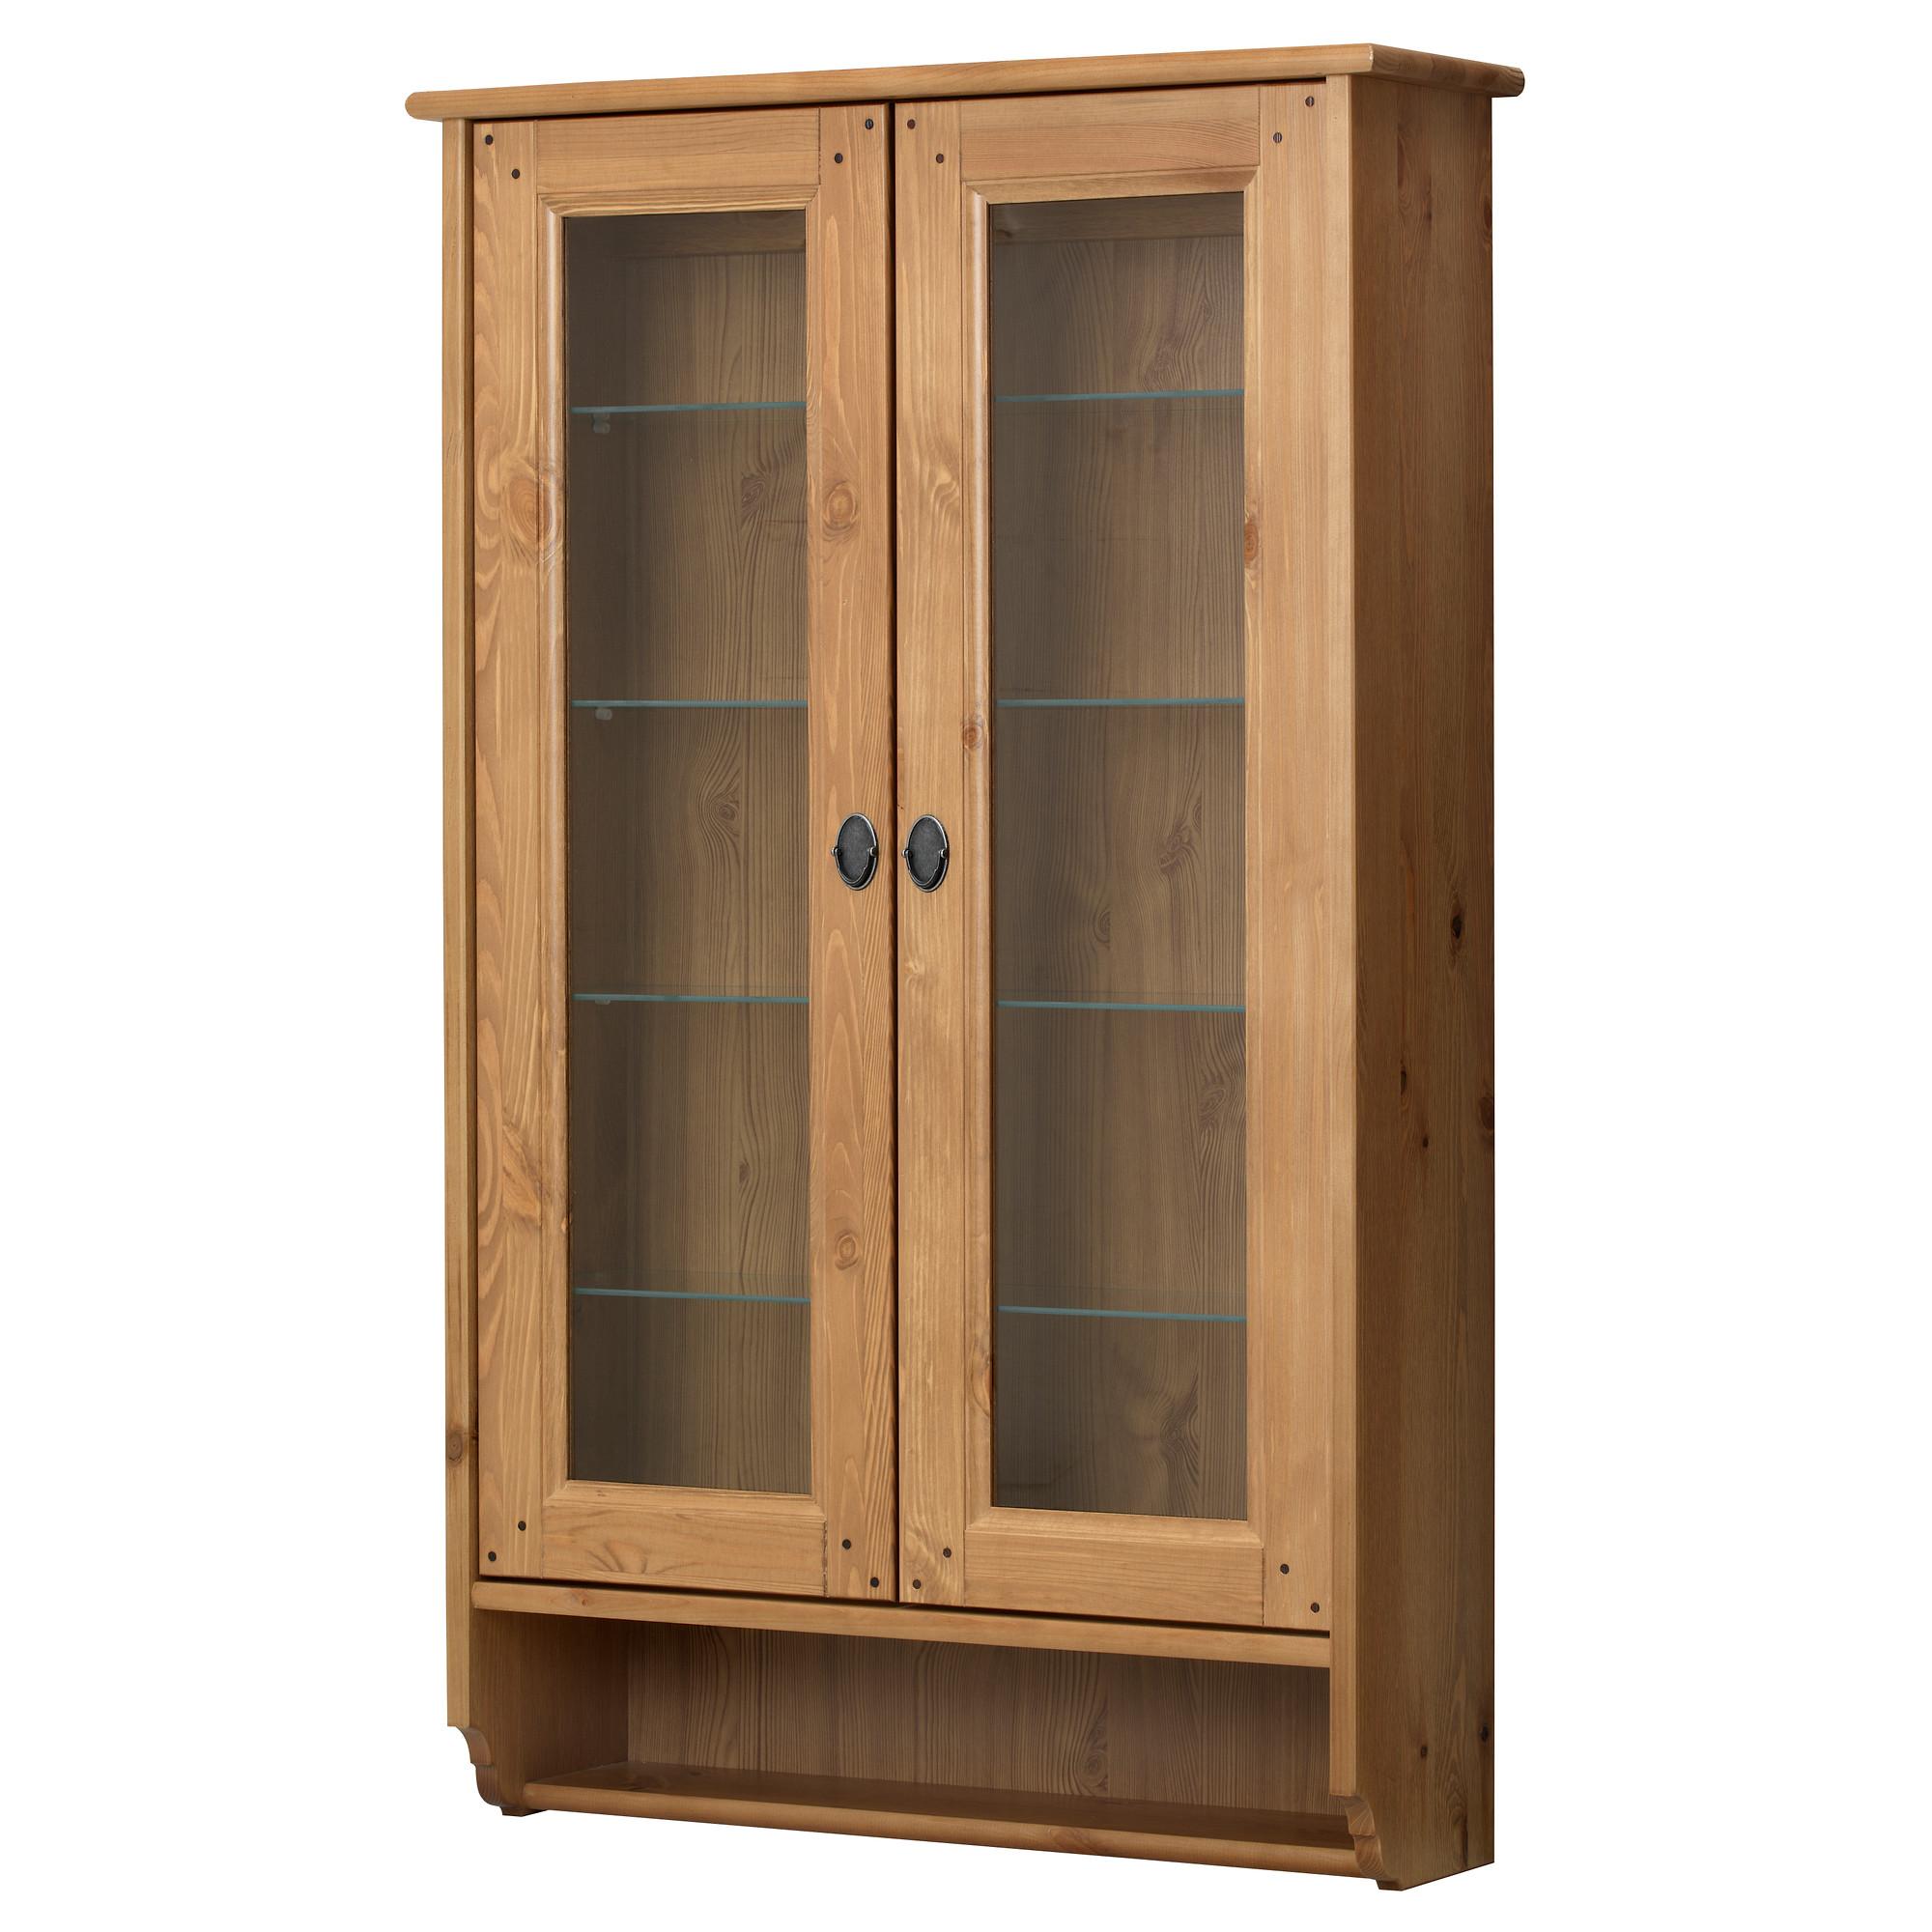 Gibaba каталог: подвесной шкаф.